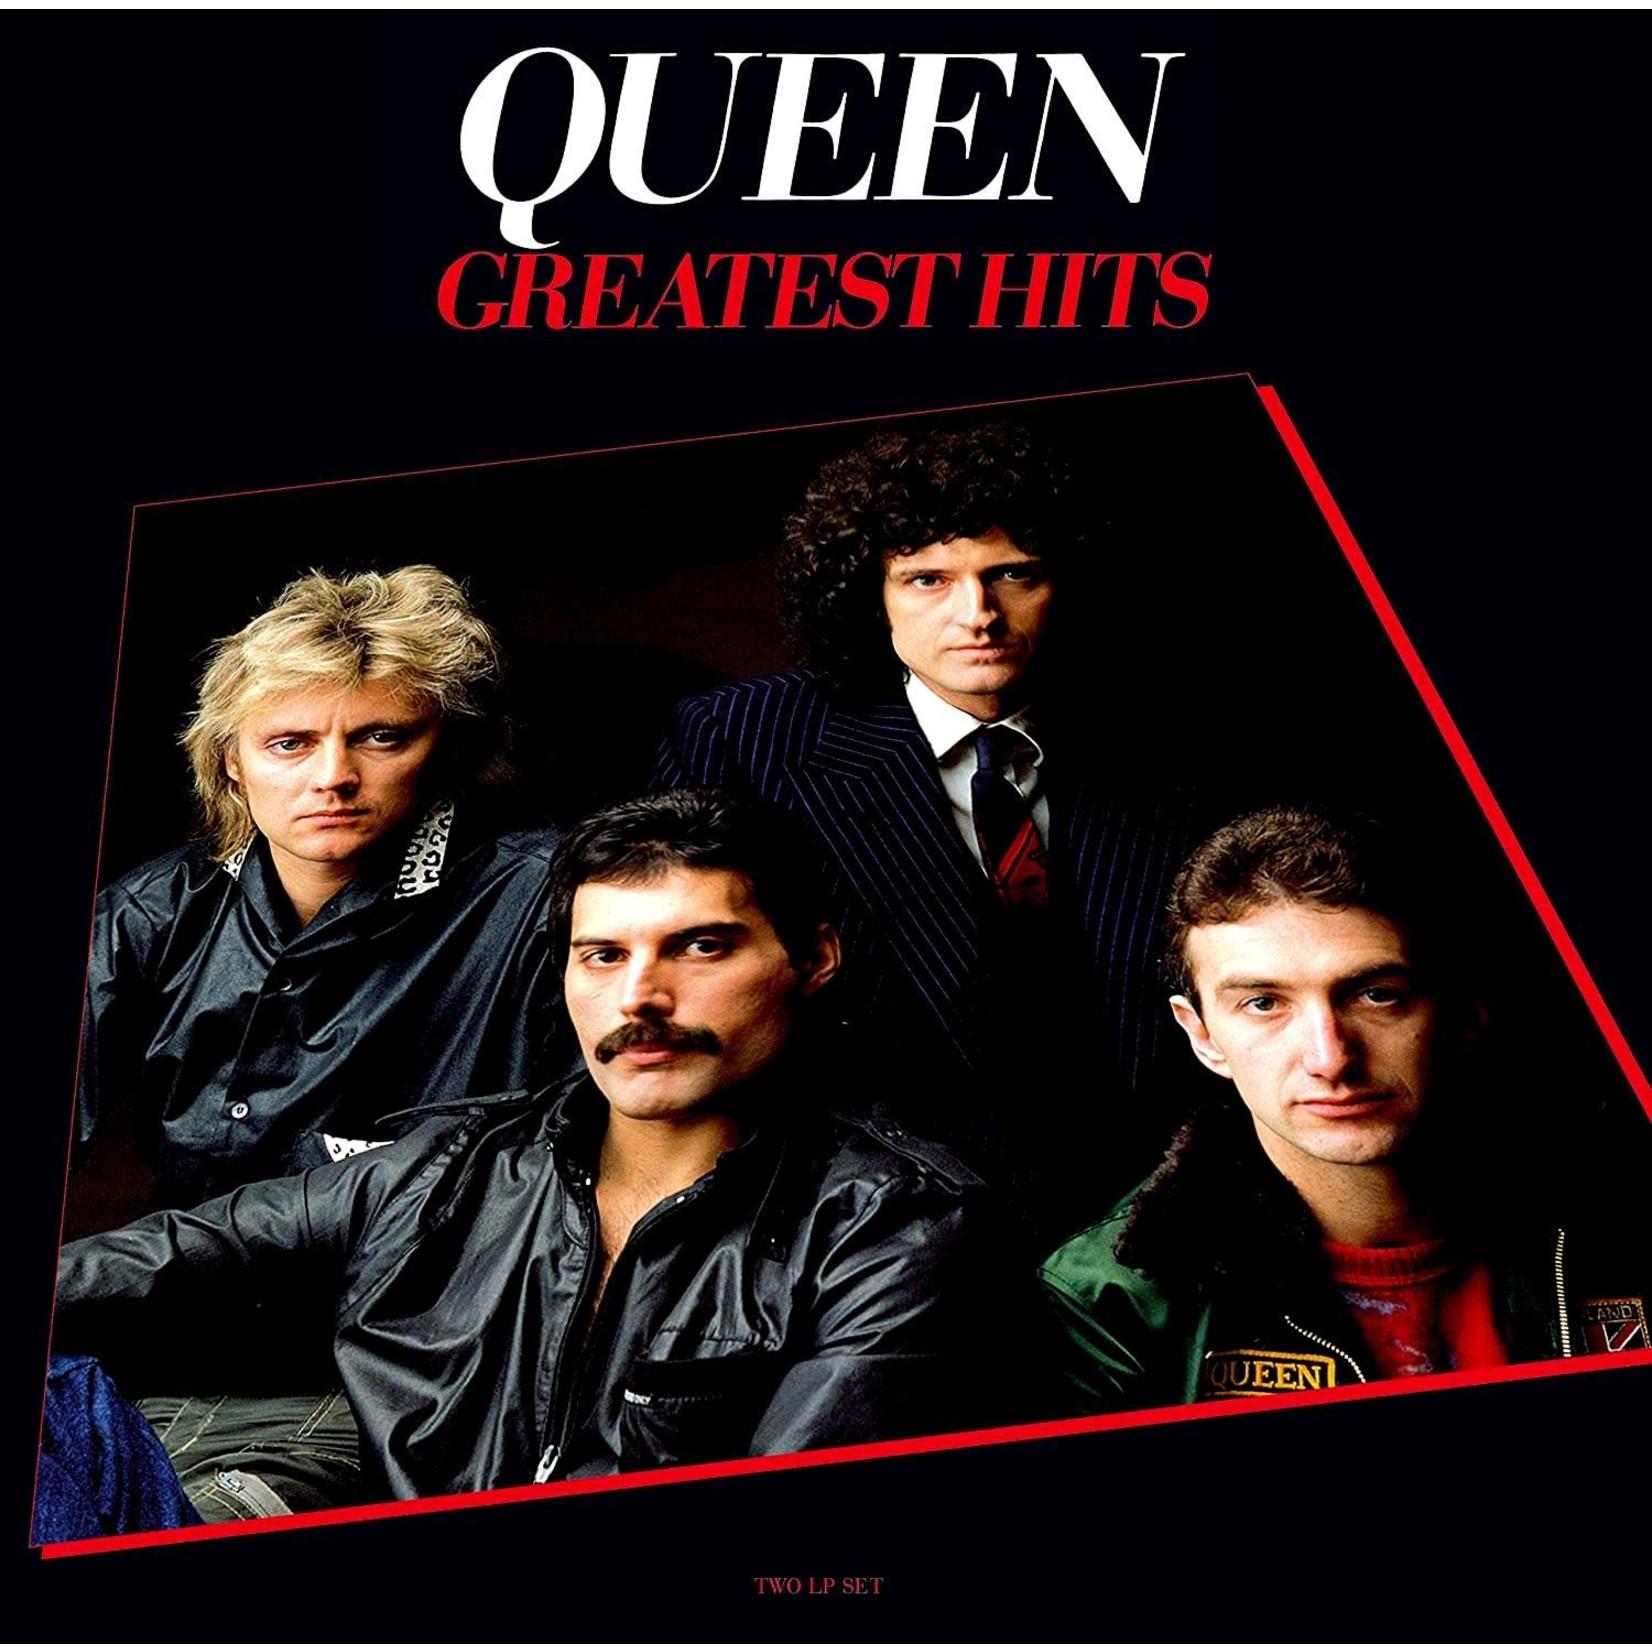 [New] Queen: Greatest Hits (2LP)